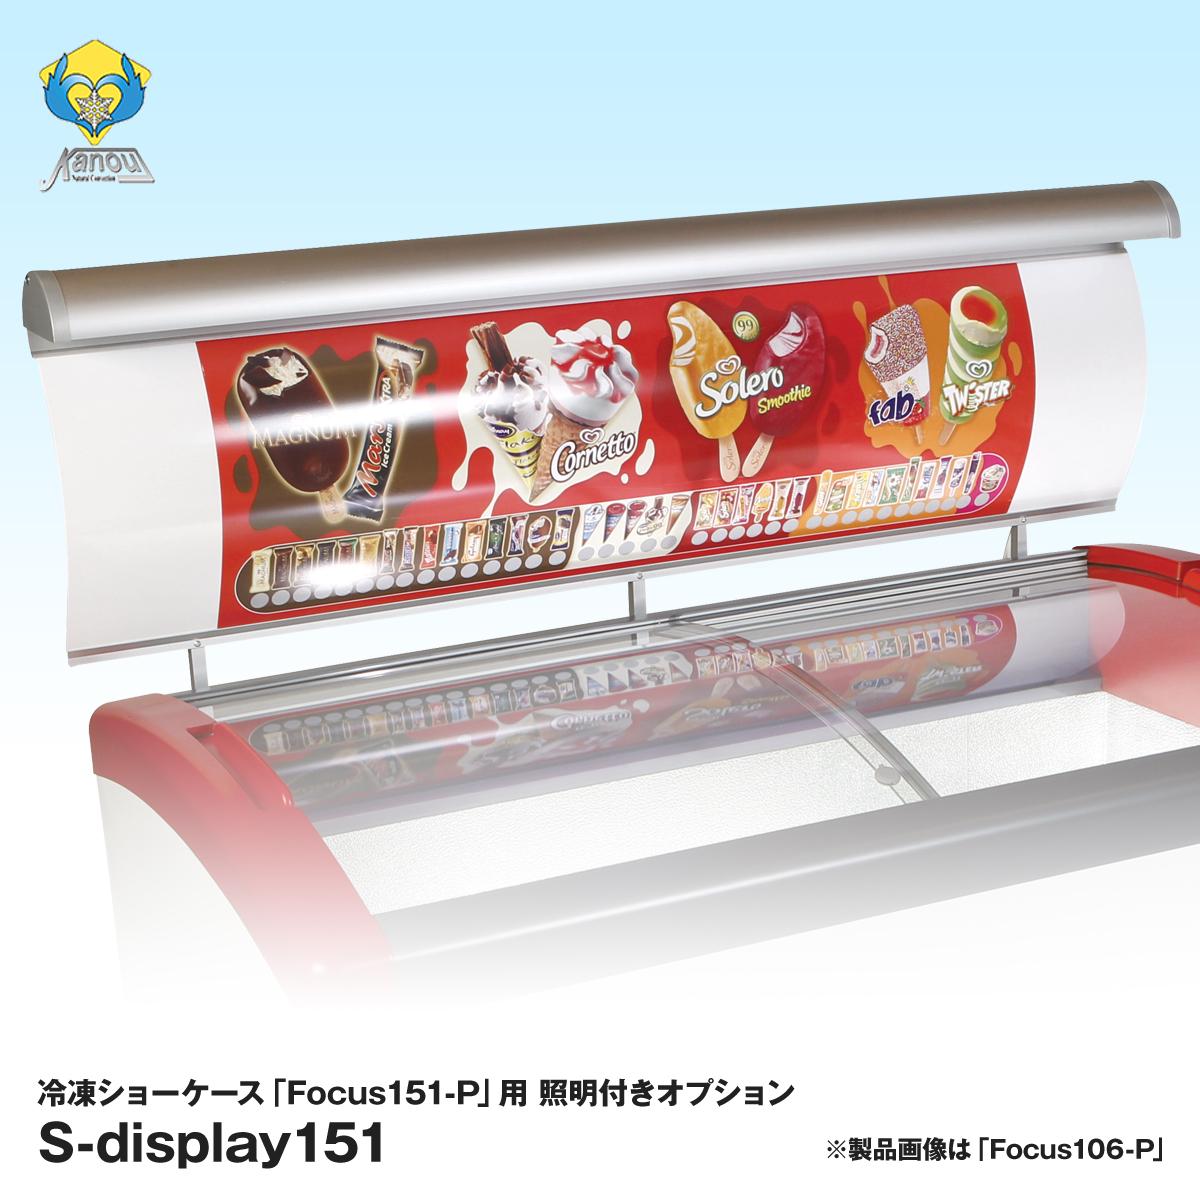 Focus151用 照明付ディスプレイ S-display151 送料無料